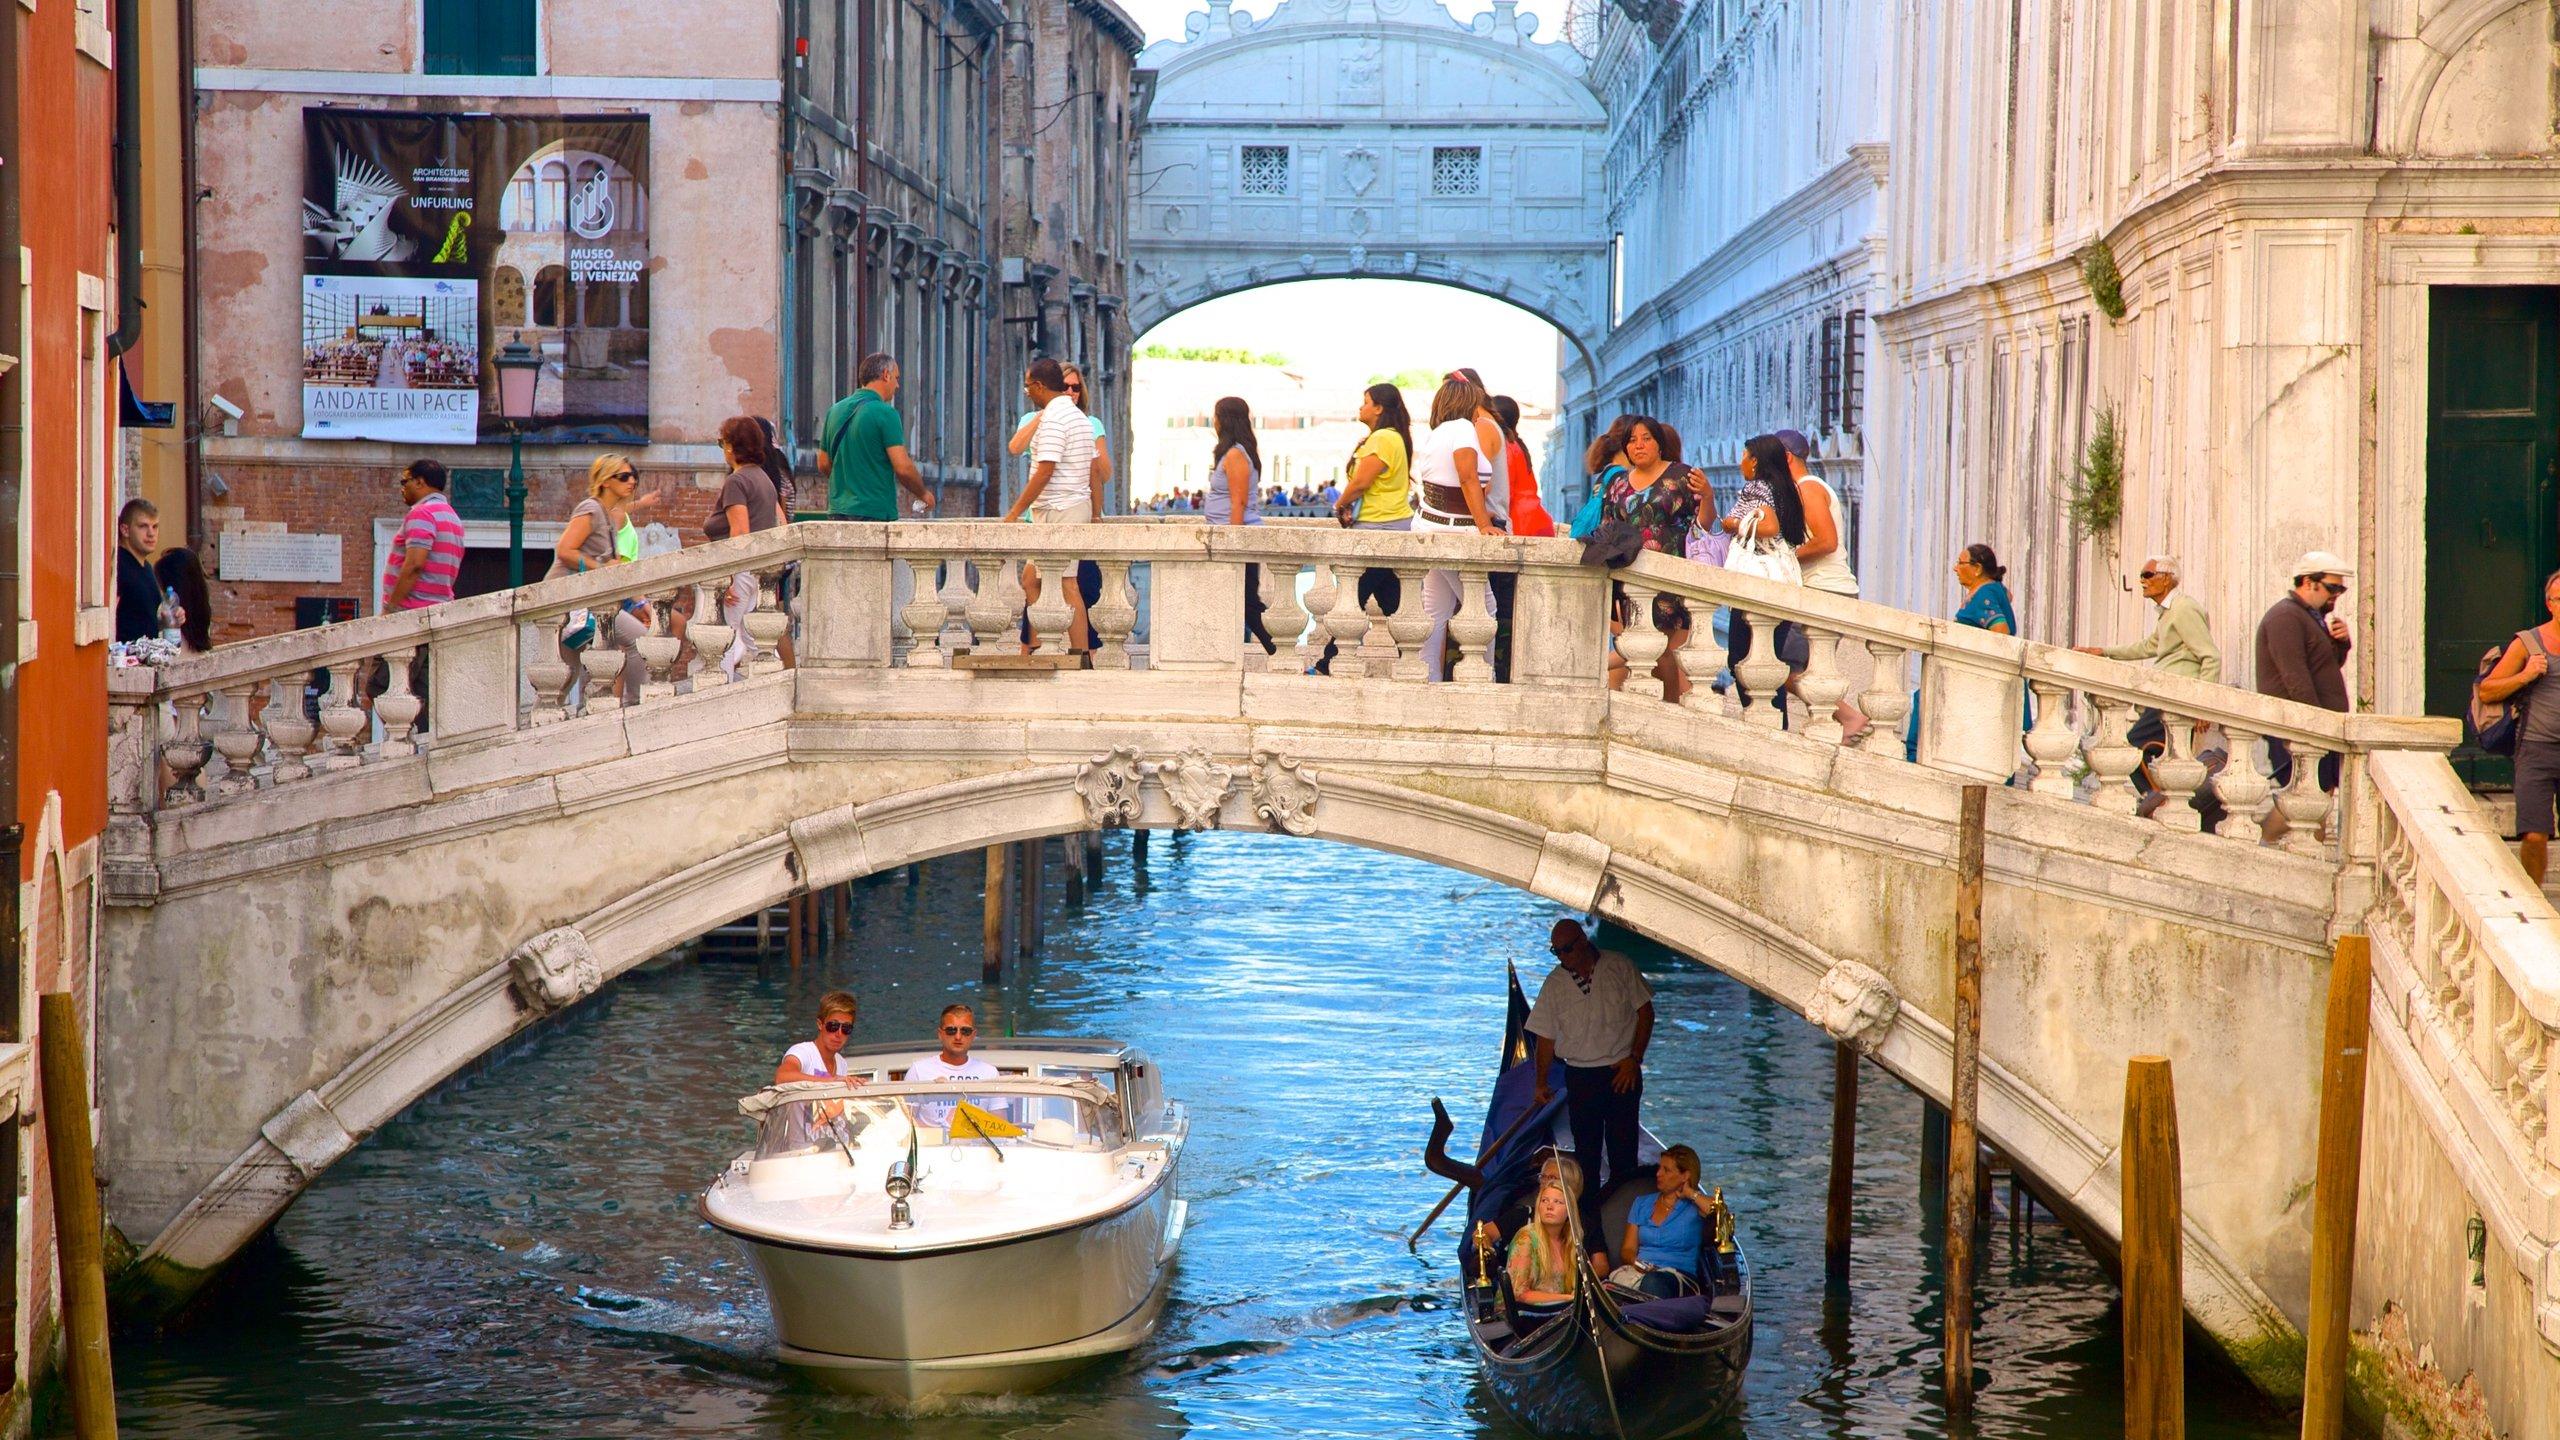 Venezia-Murano-Burano, Veneto, Italy